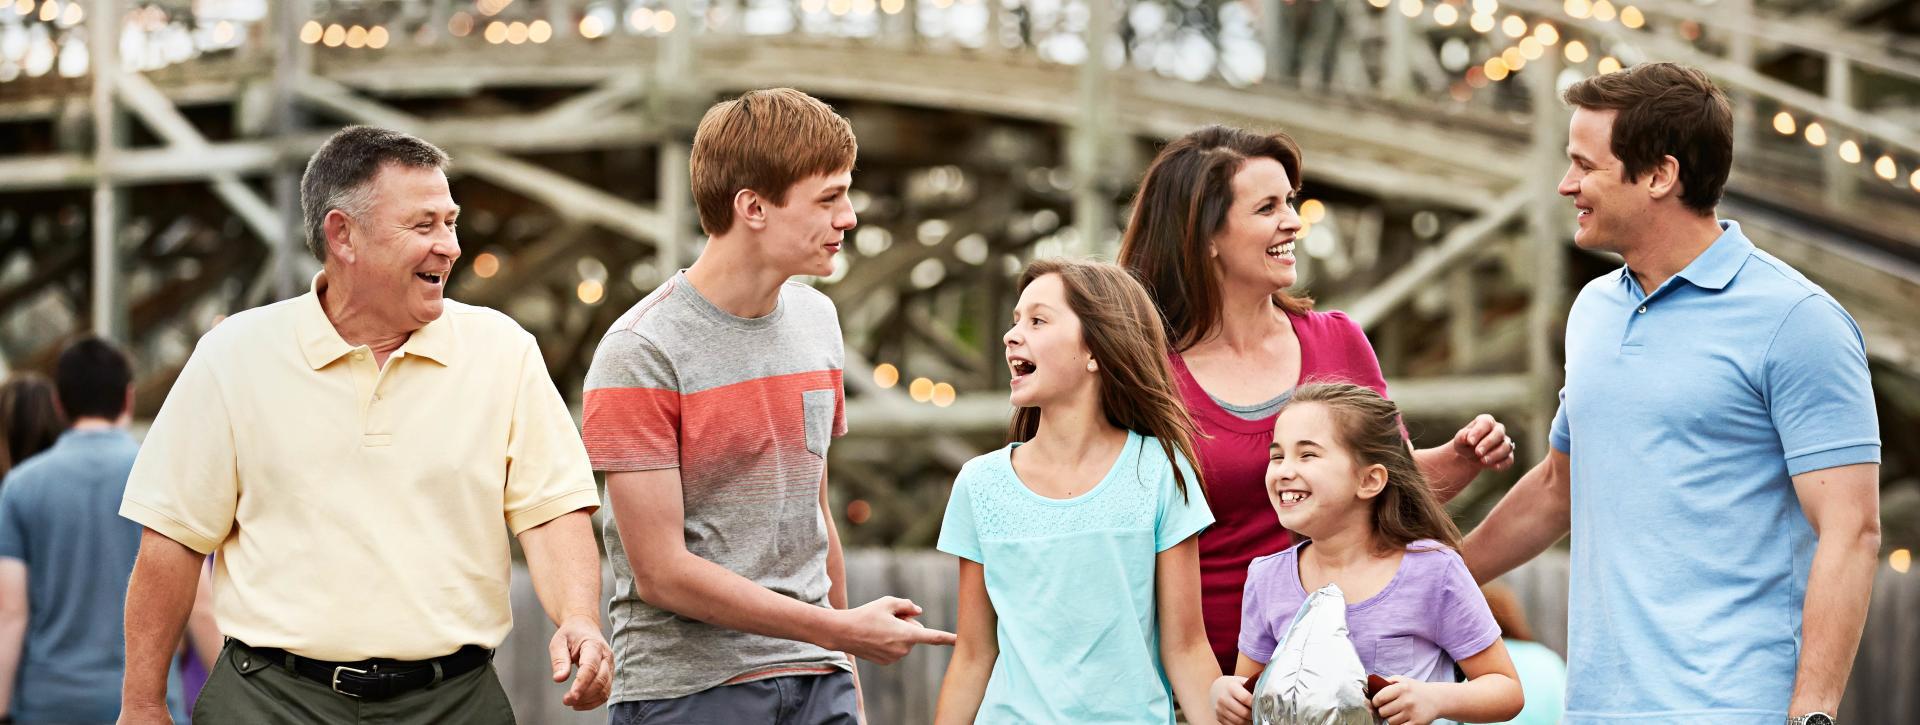 hersheypark-family